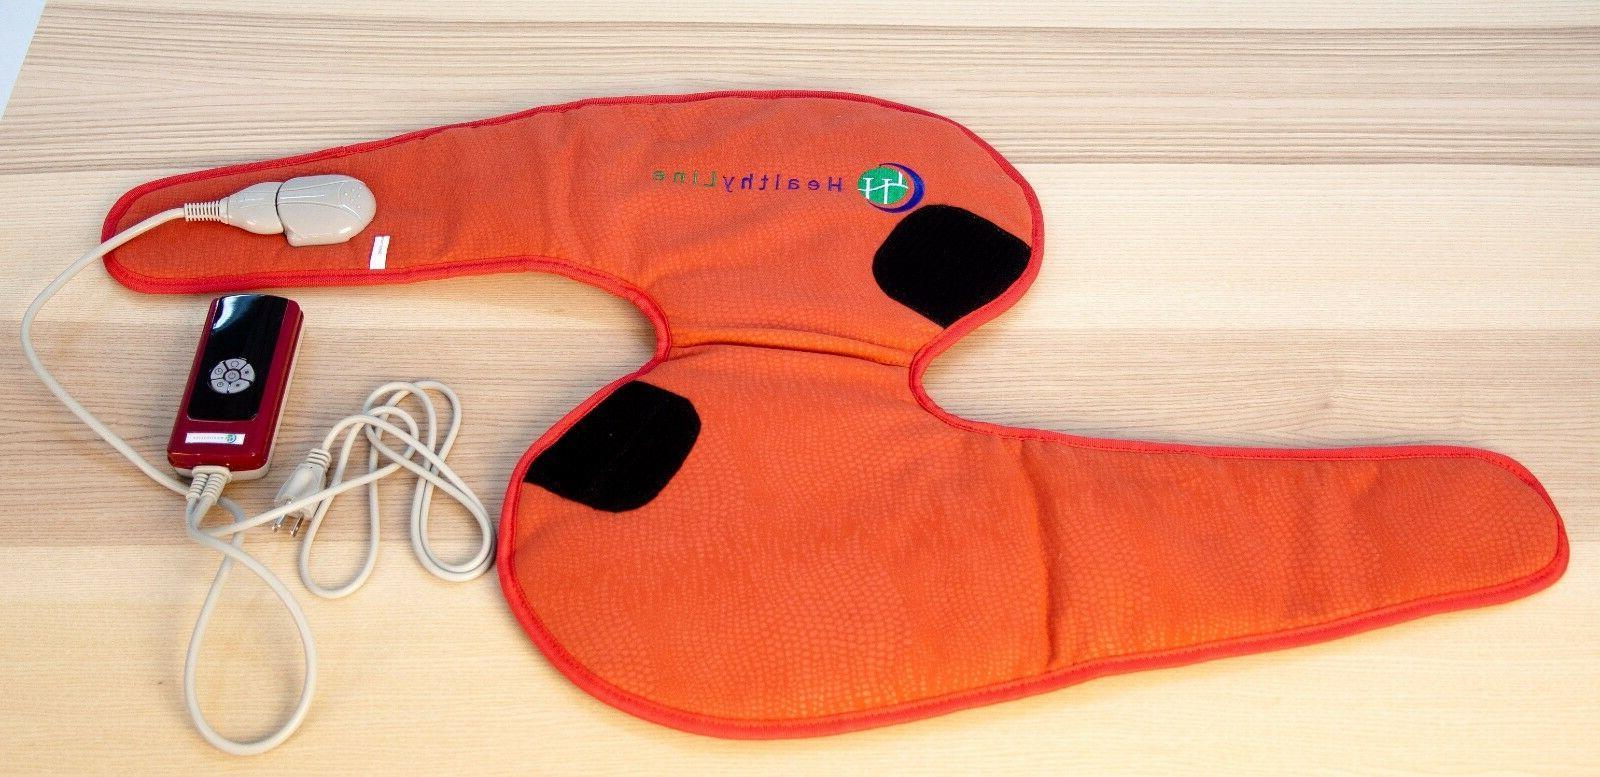 HealthyLine Tourmaline Hot Brace Pad Infrared